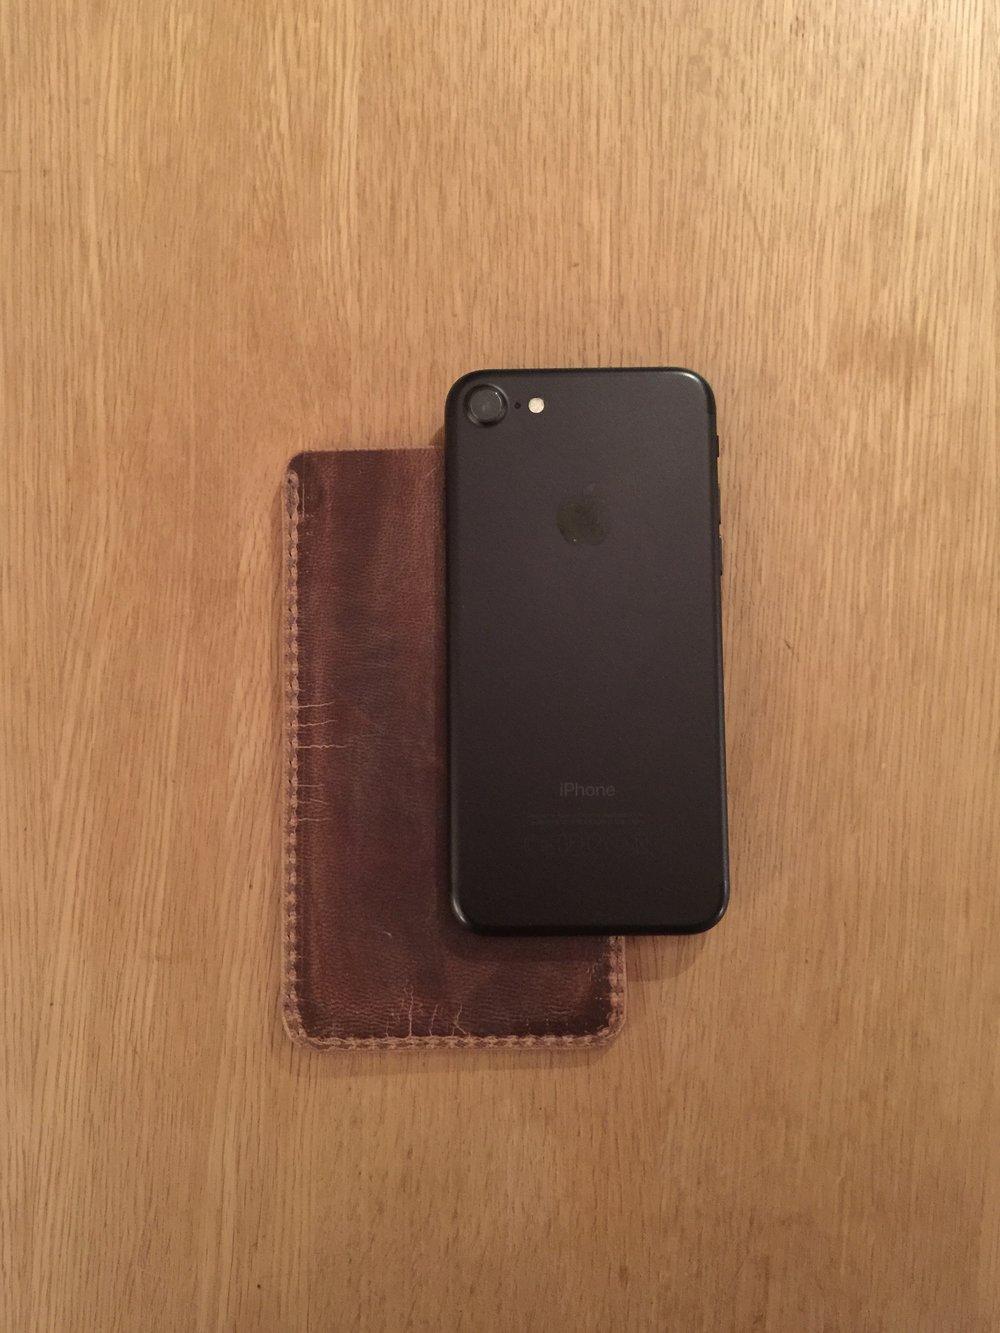 Casual snob - Ryan London Case Iphone 7 - 4.jpg